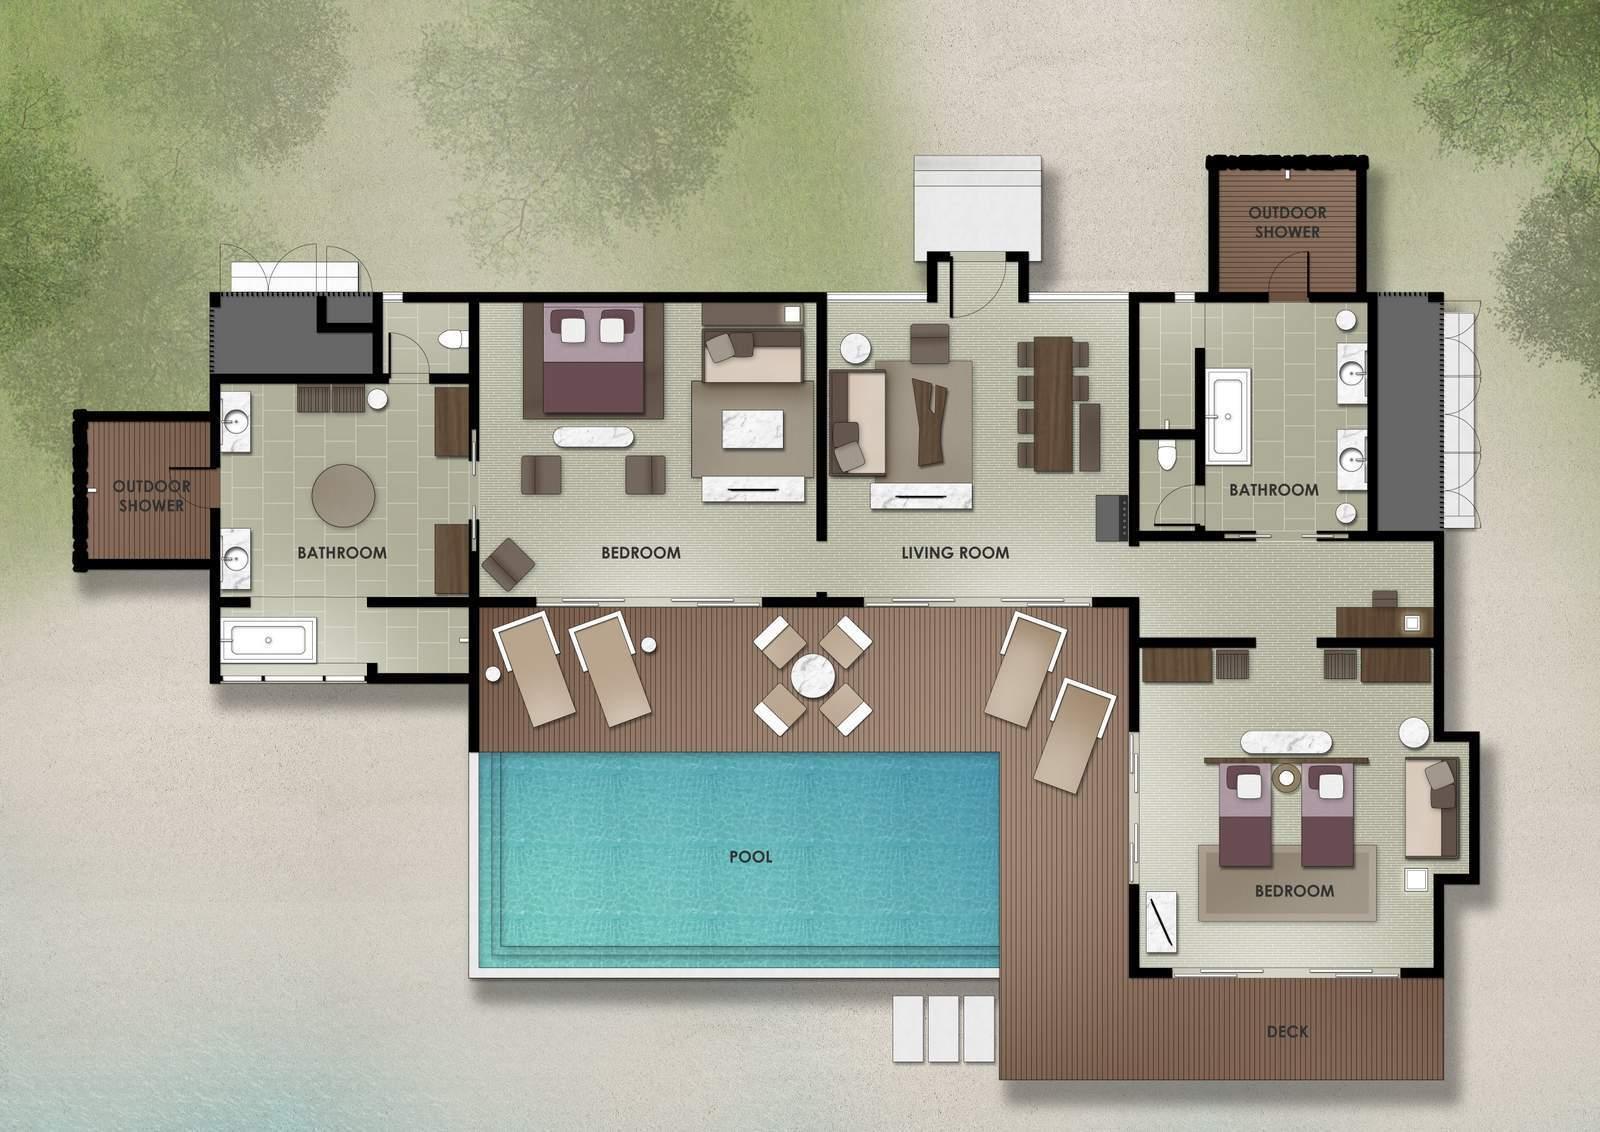 Мальдивы, отель The Residence Maldives at Dhigurah, план-схема номера Two-Bedroom Beach Pool Villa